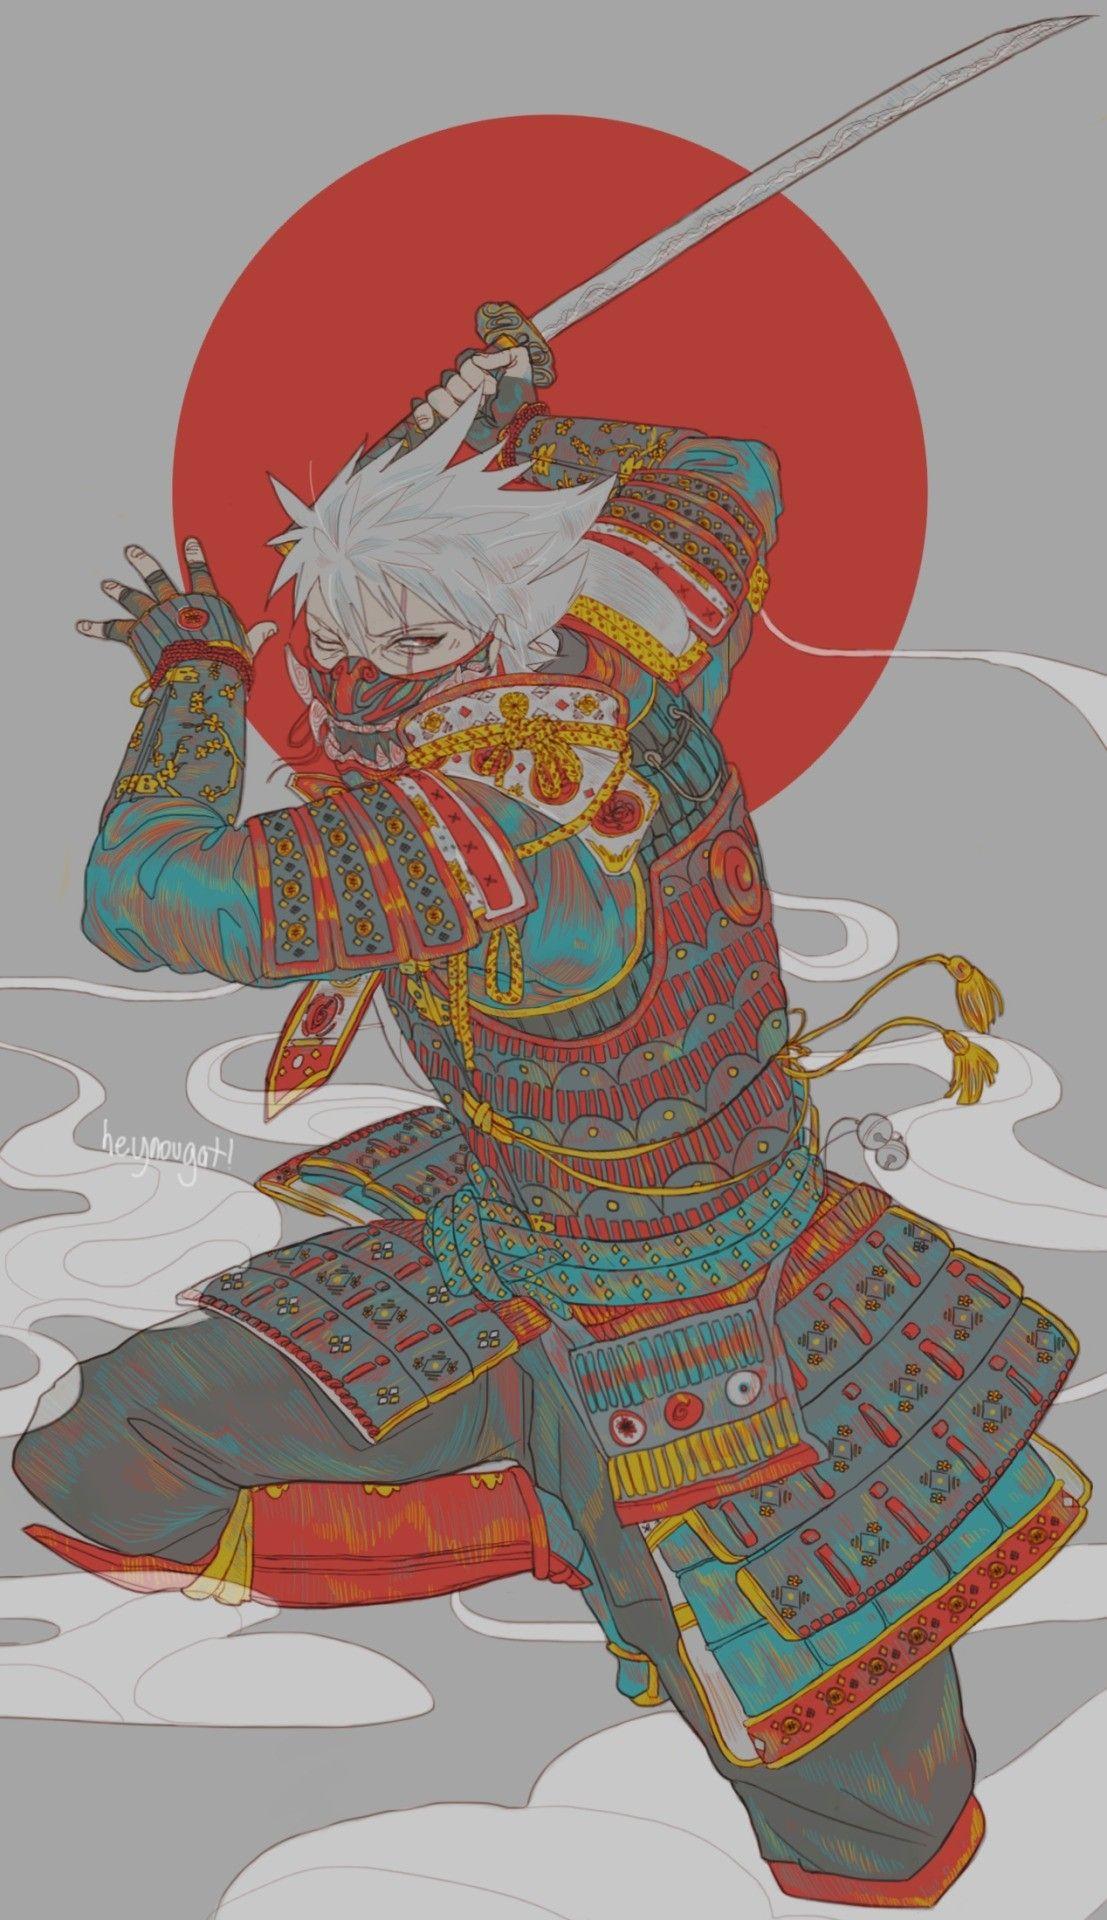 Pin By Madara Uchiha On Insp Art Samurai Artwork Naruto Art Samurai Art